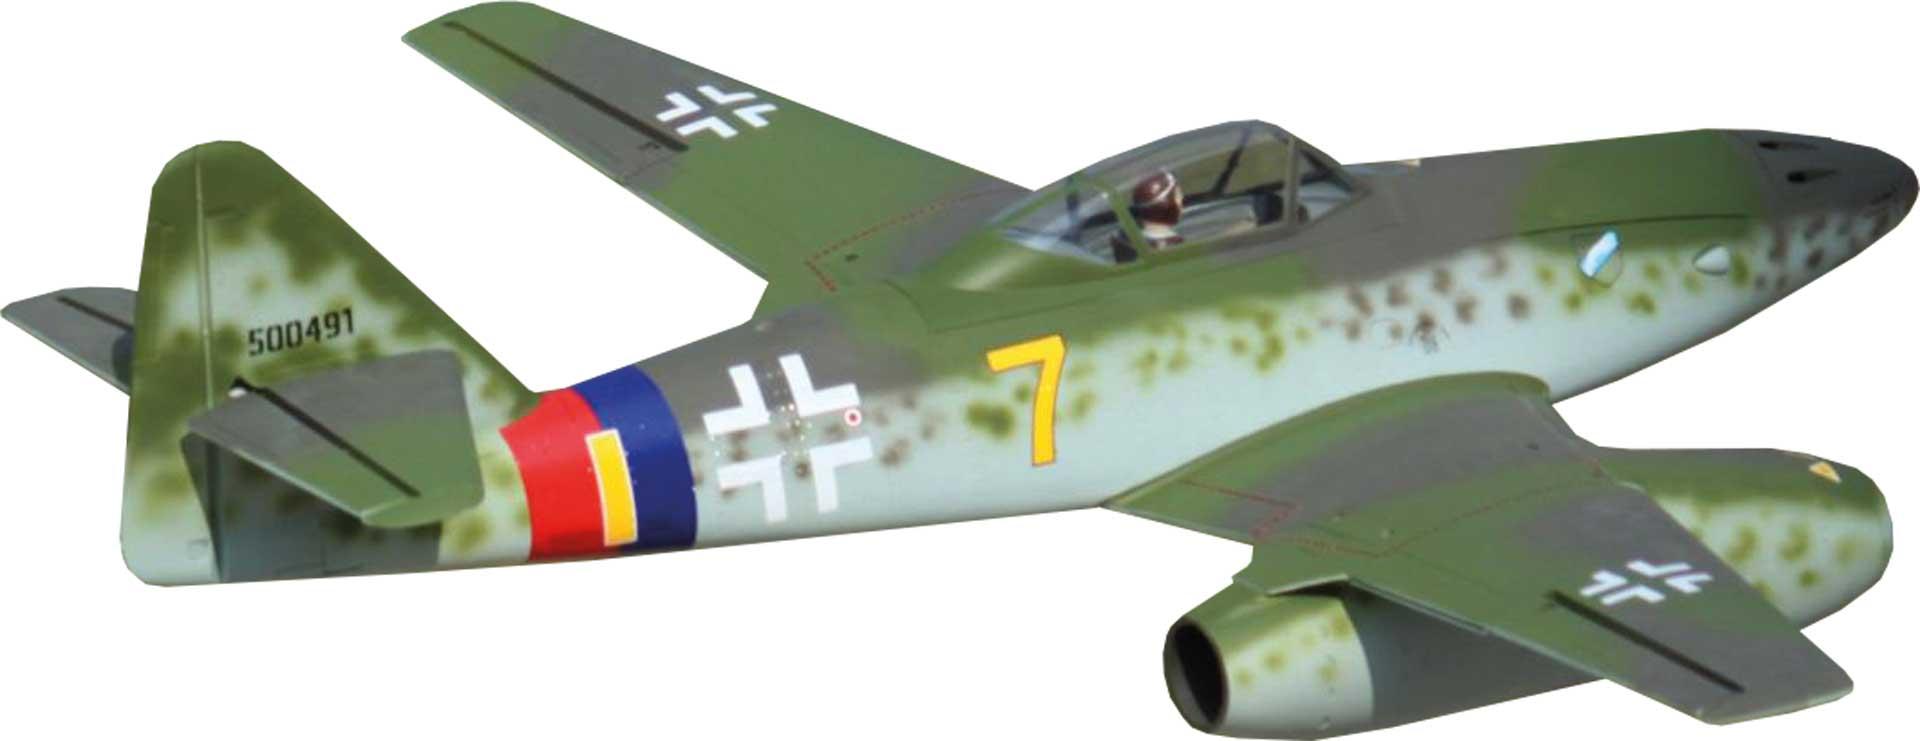 "FREEWING Messerschmitt Me 262 ""Yellow 7"" V2 Twin 70mm EDF Jet - PNP"